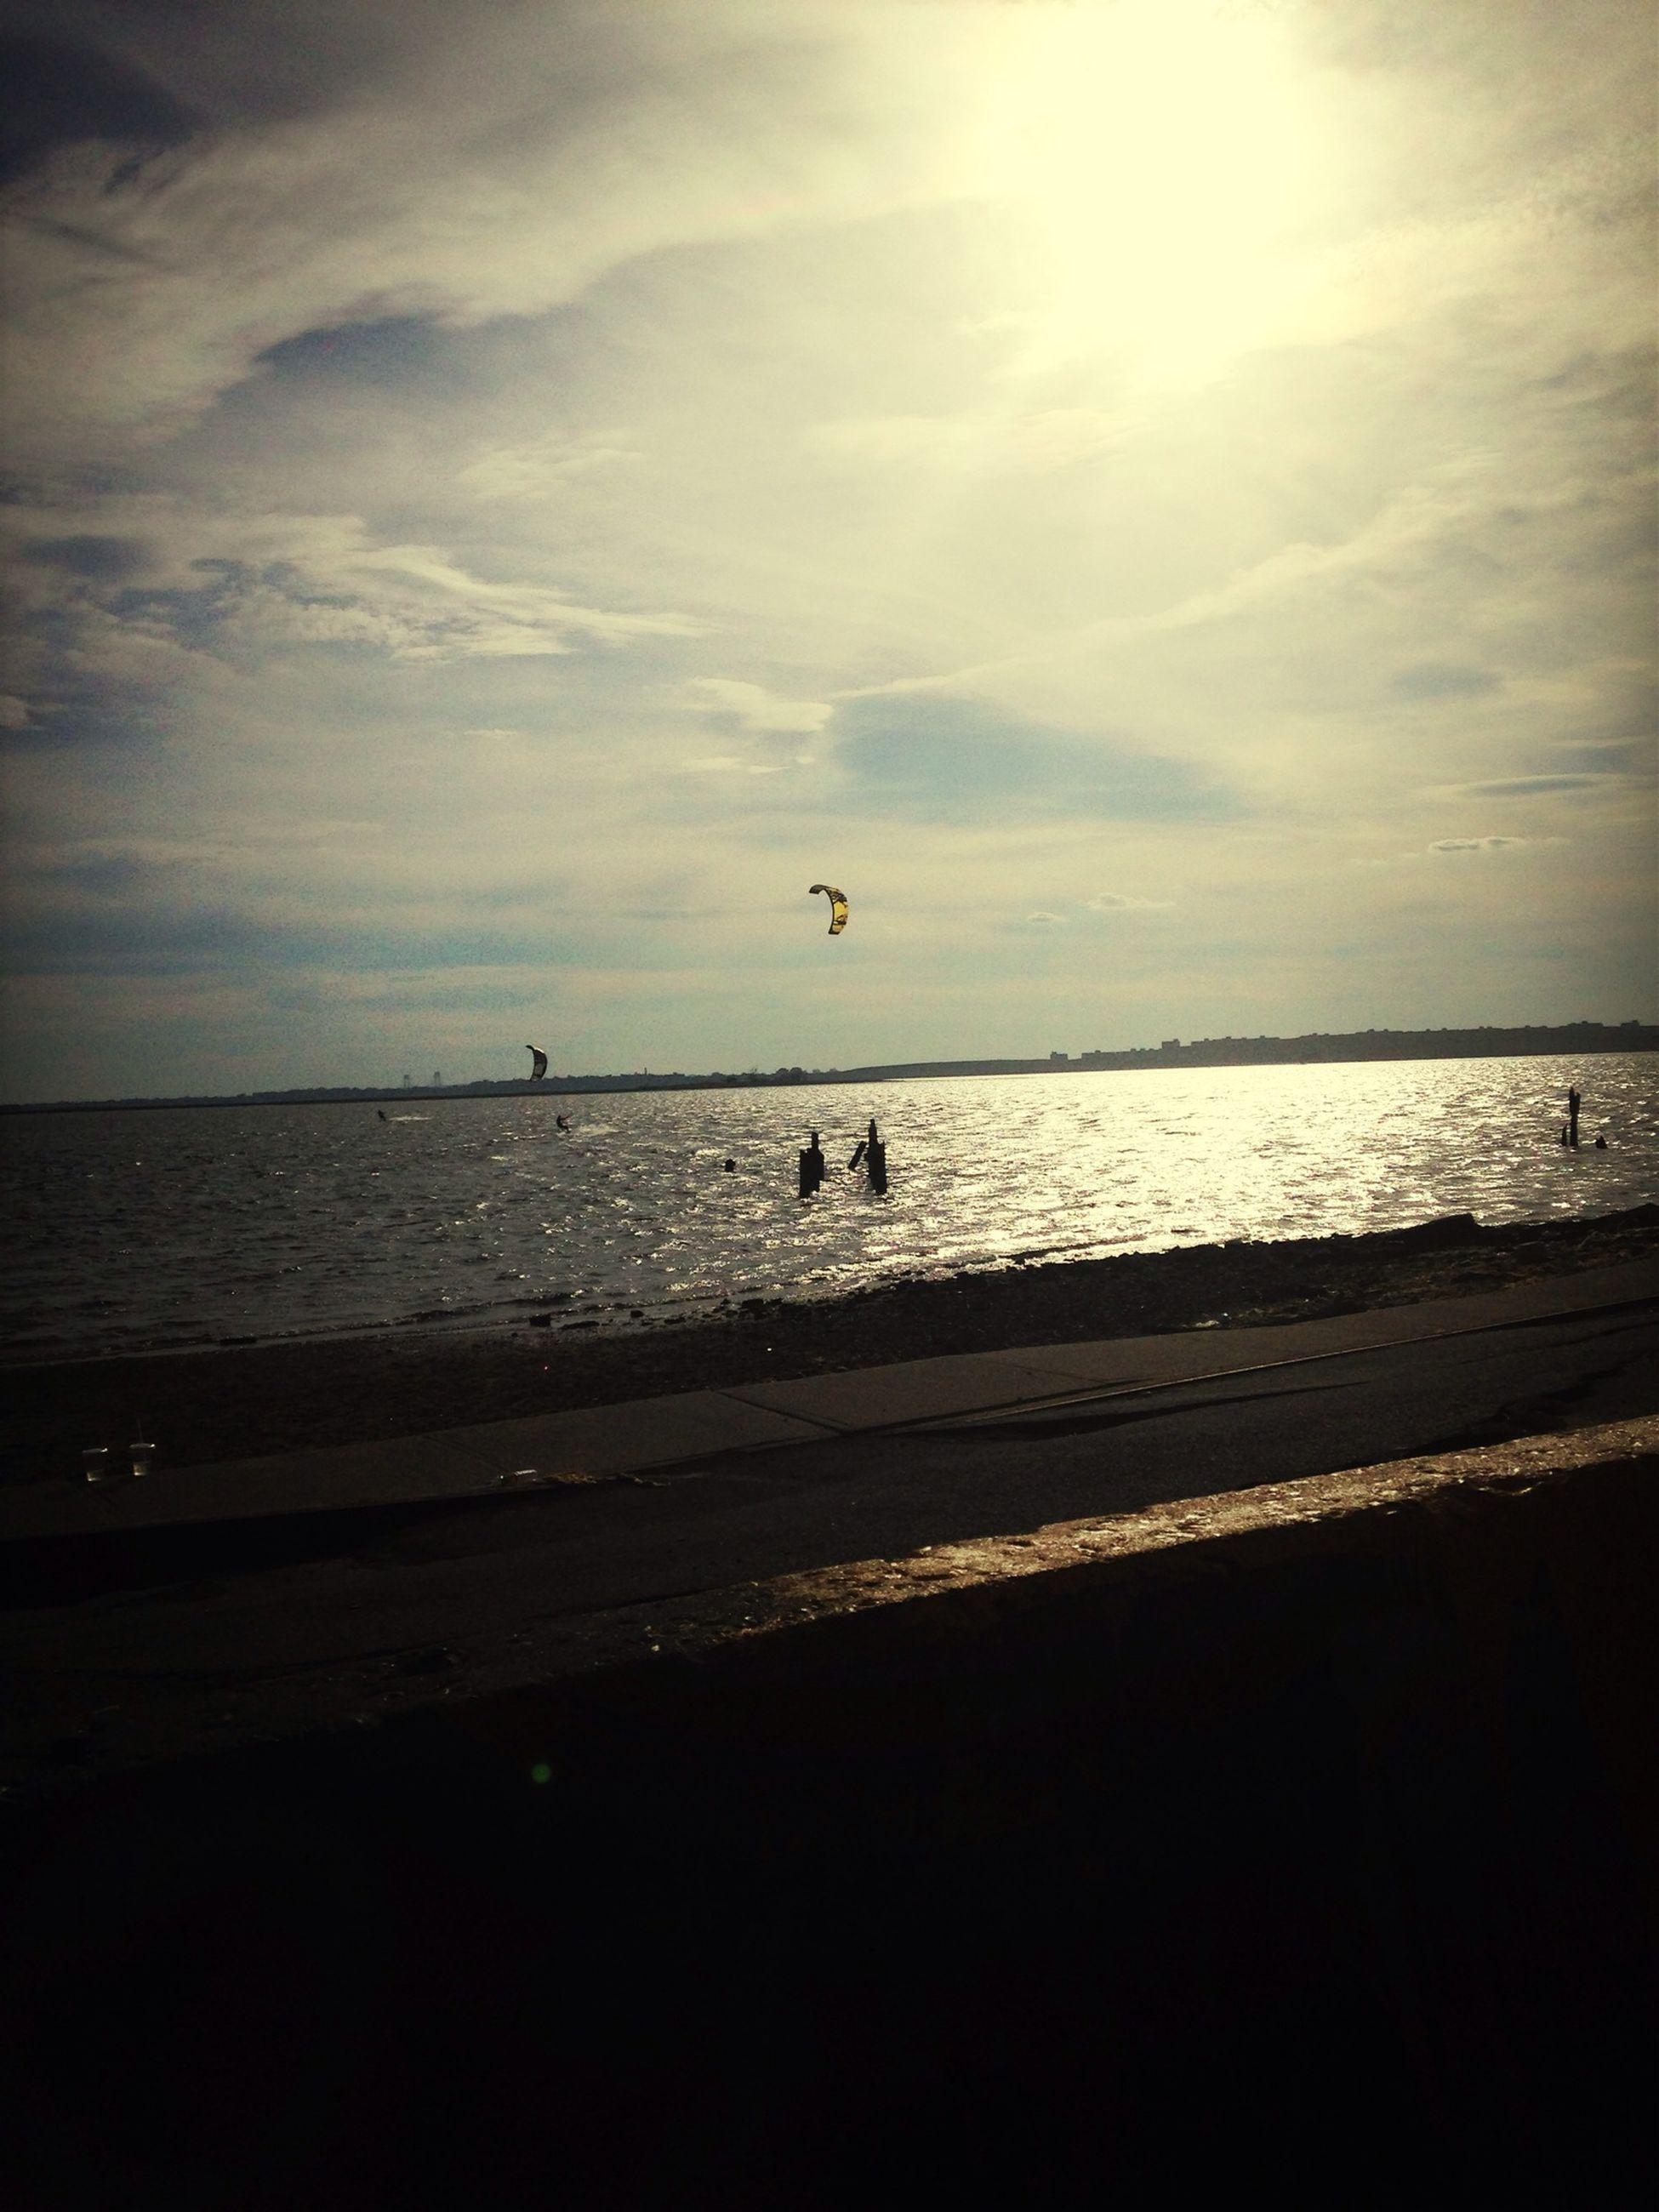 sea, horizon over water, beach, water, sky, scenics, shore, tranquil scene, tranquility, beauty in nature, cloud - sky, sun, nature, sand, silhouette, sunlight, idyllic, animal themes, sunset, cloud